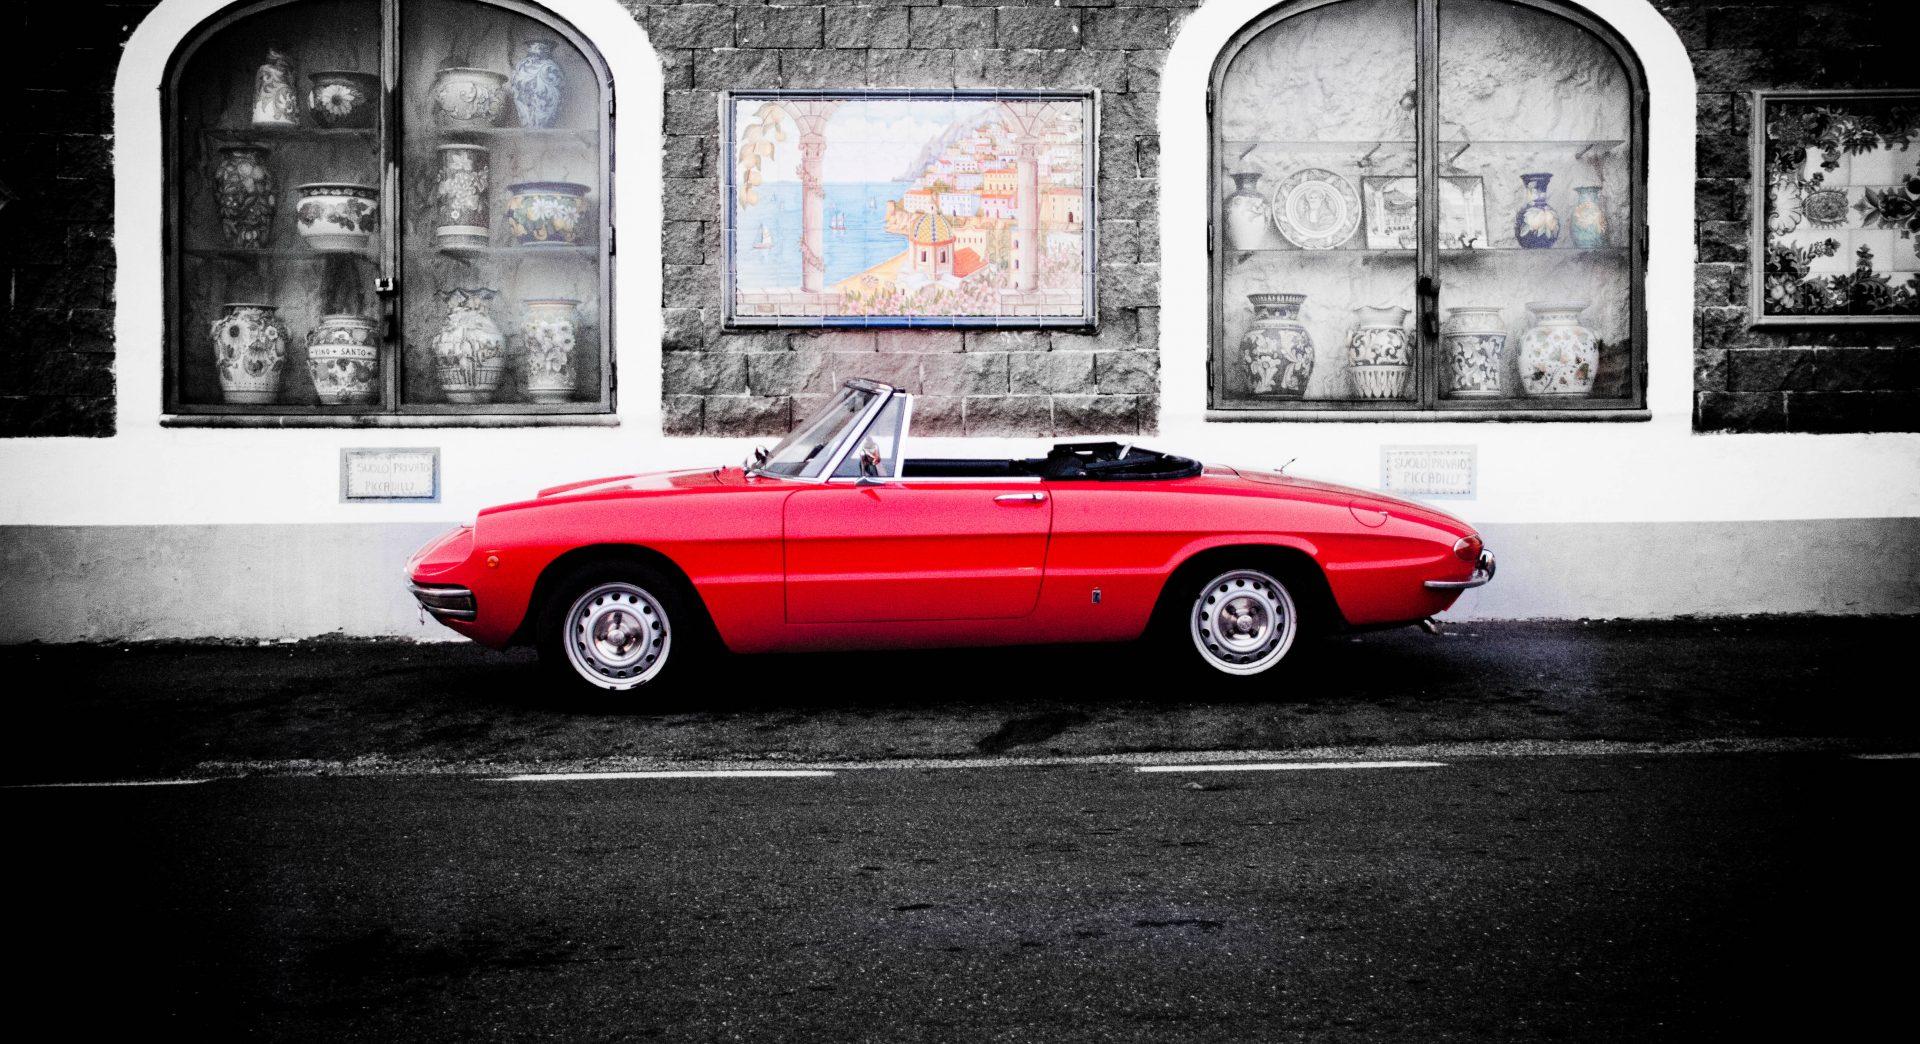 Car hire amalfi coast - rental classic car Sorrento - Spider life ...